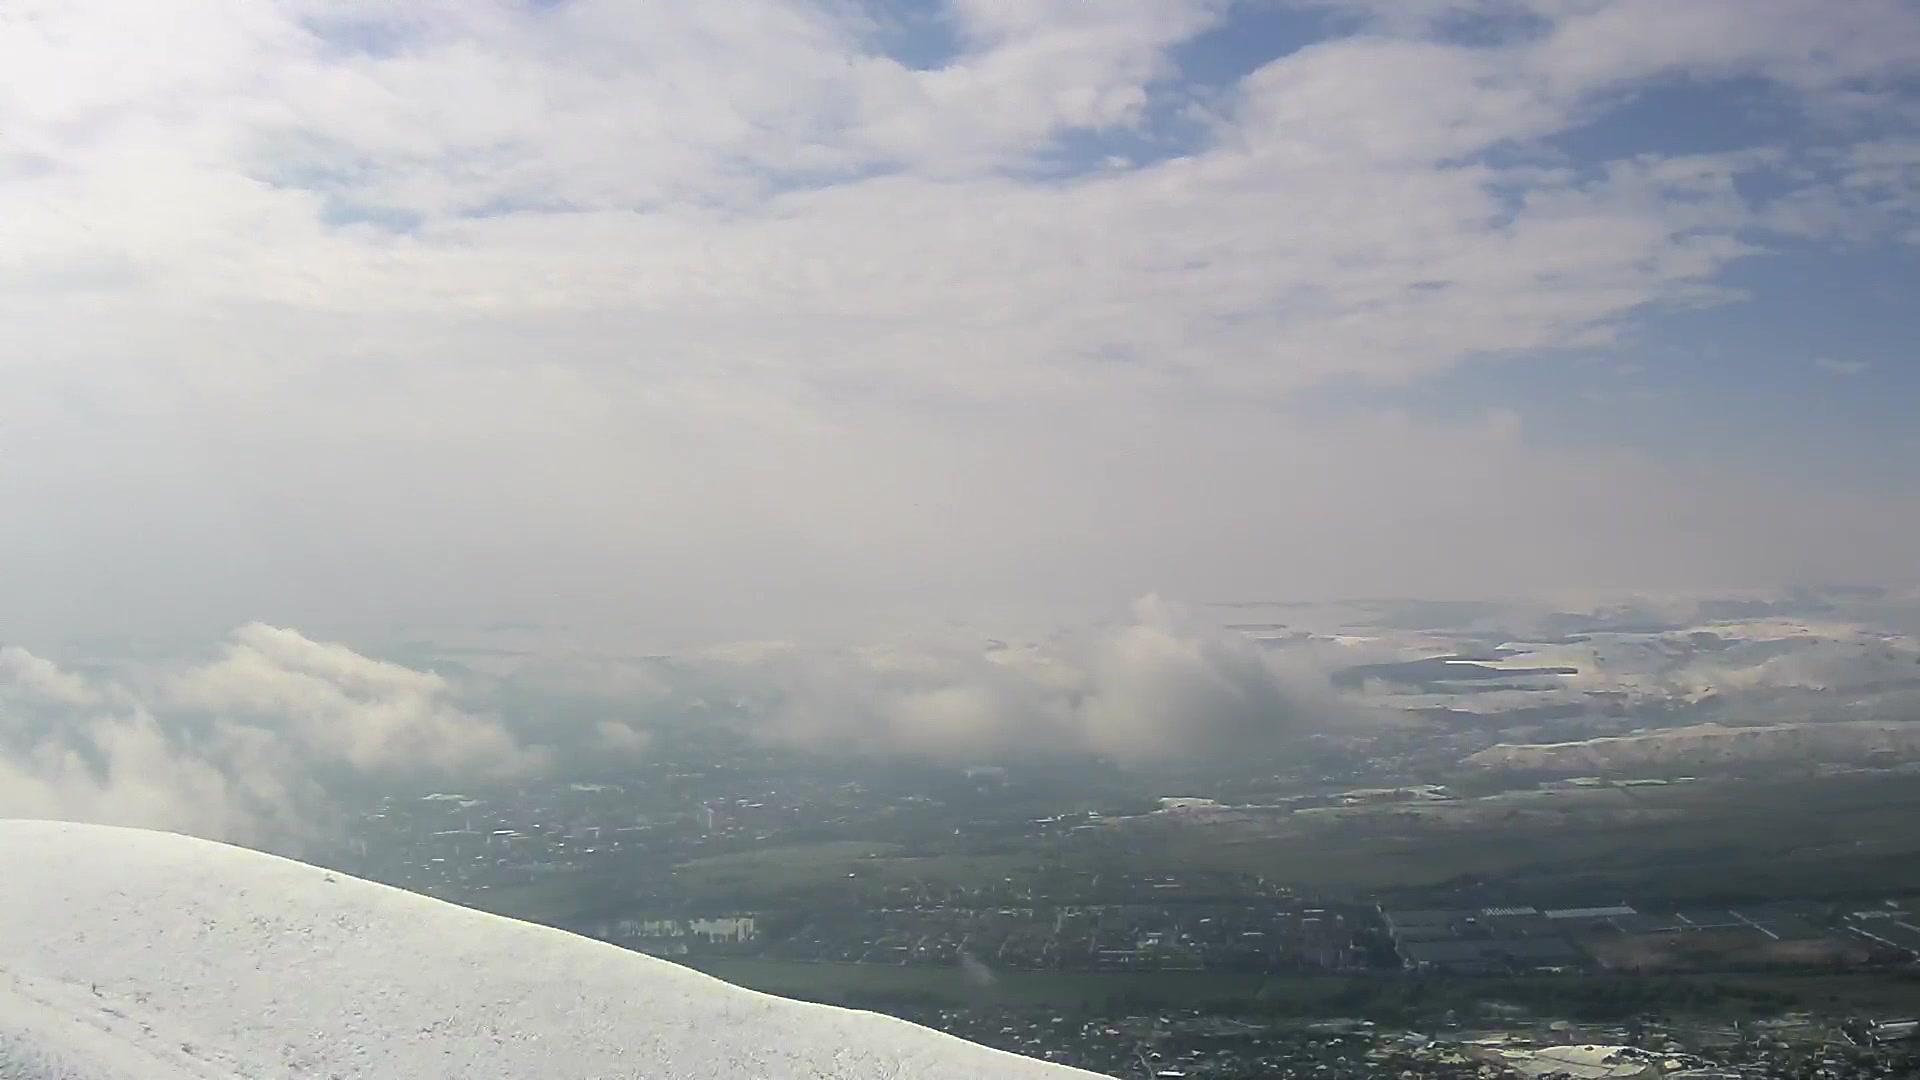 Webkamera Kislovodsk › South: Mount Elbrus